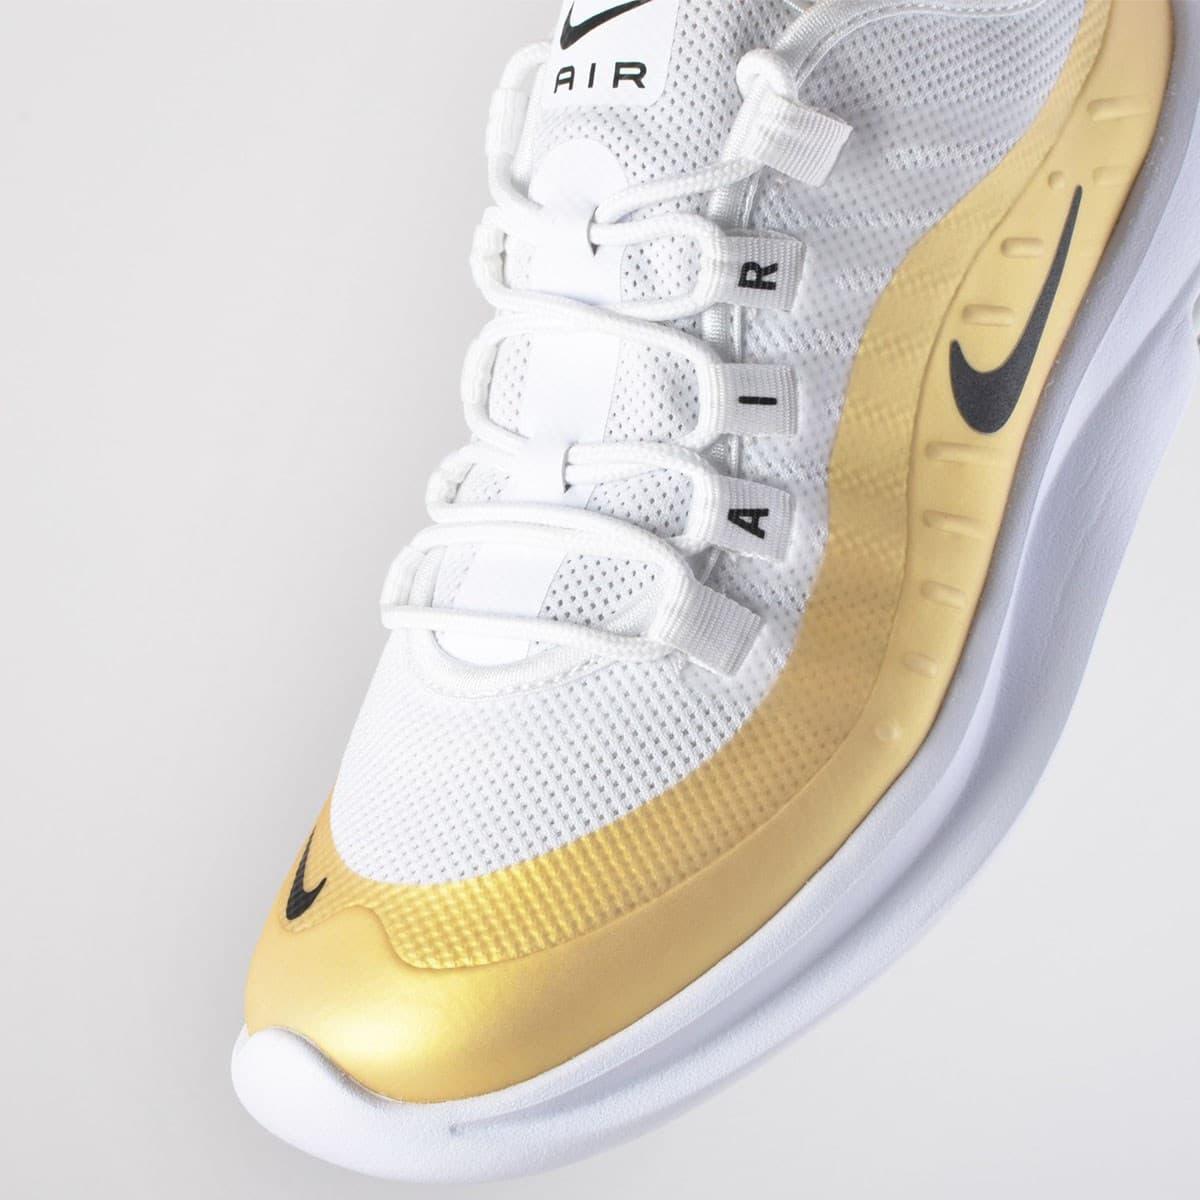 Air Max Axis Kadın Beyaz Spor Ayakkabı (AA2168-103)